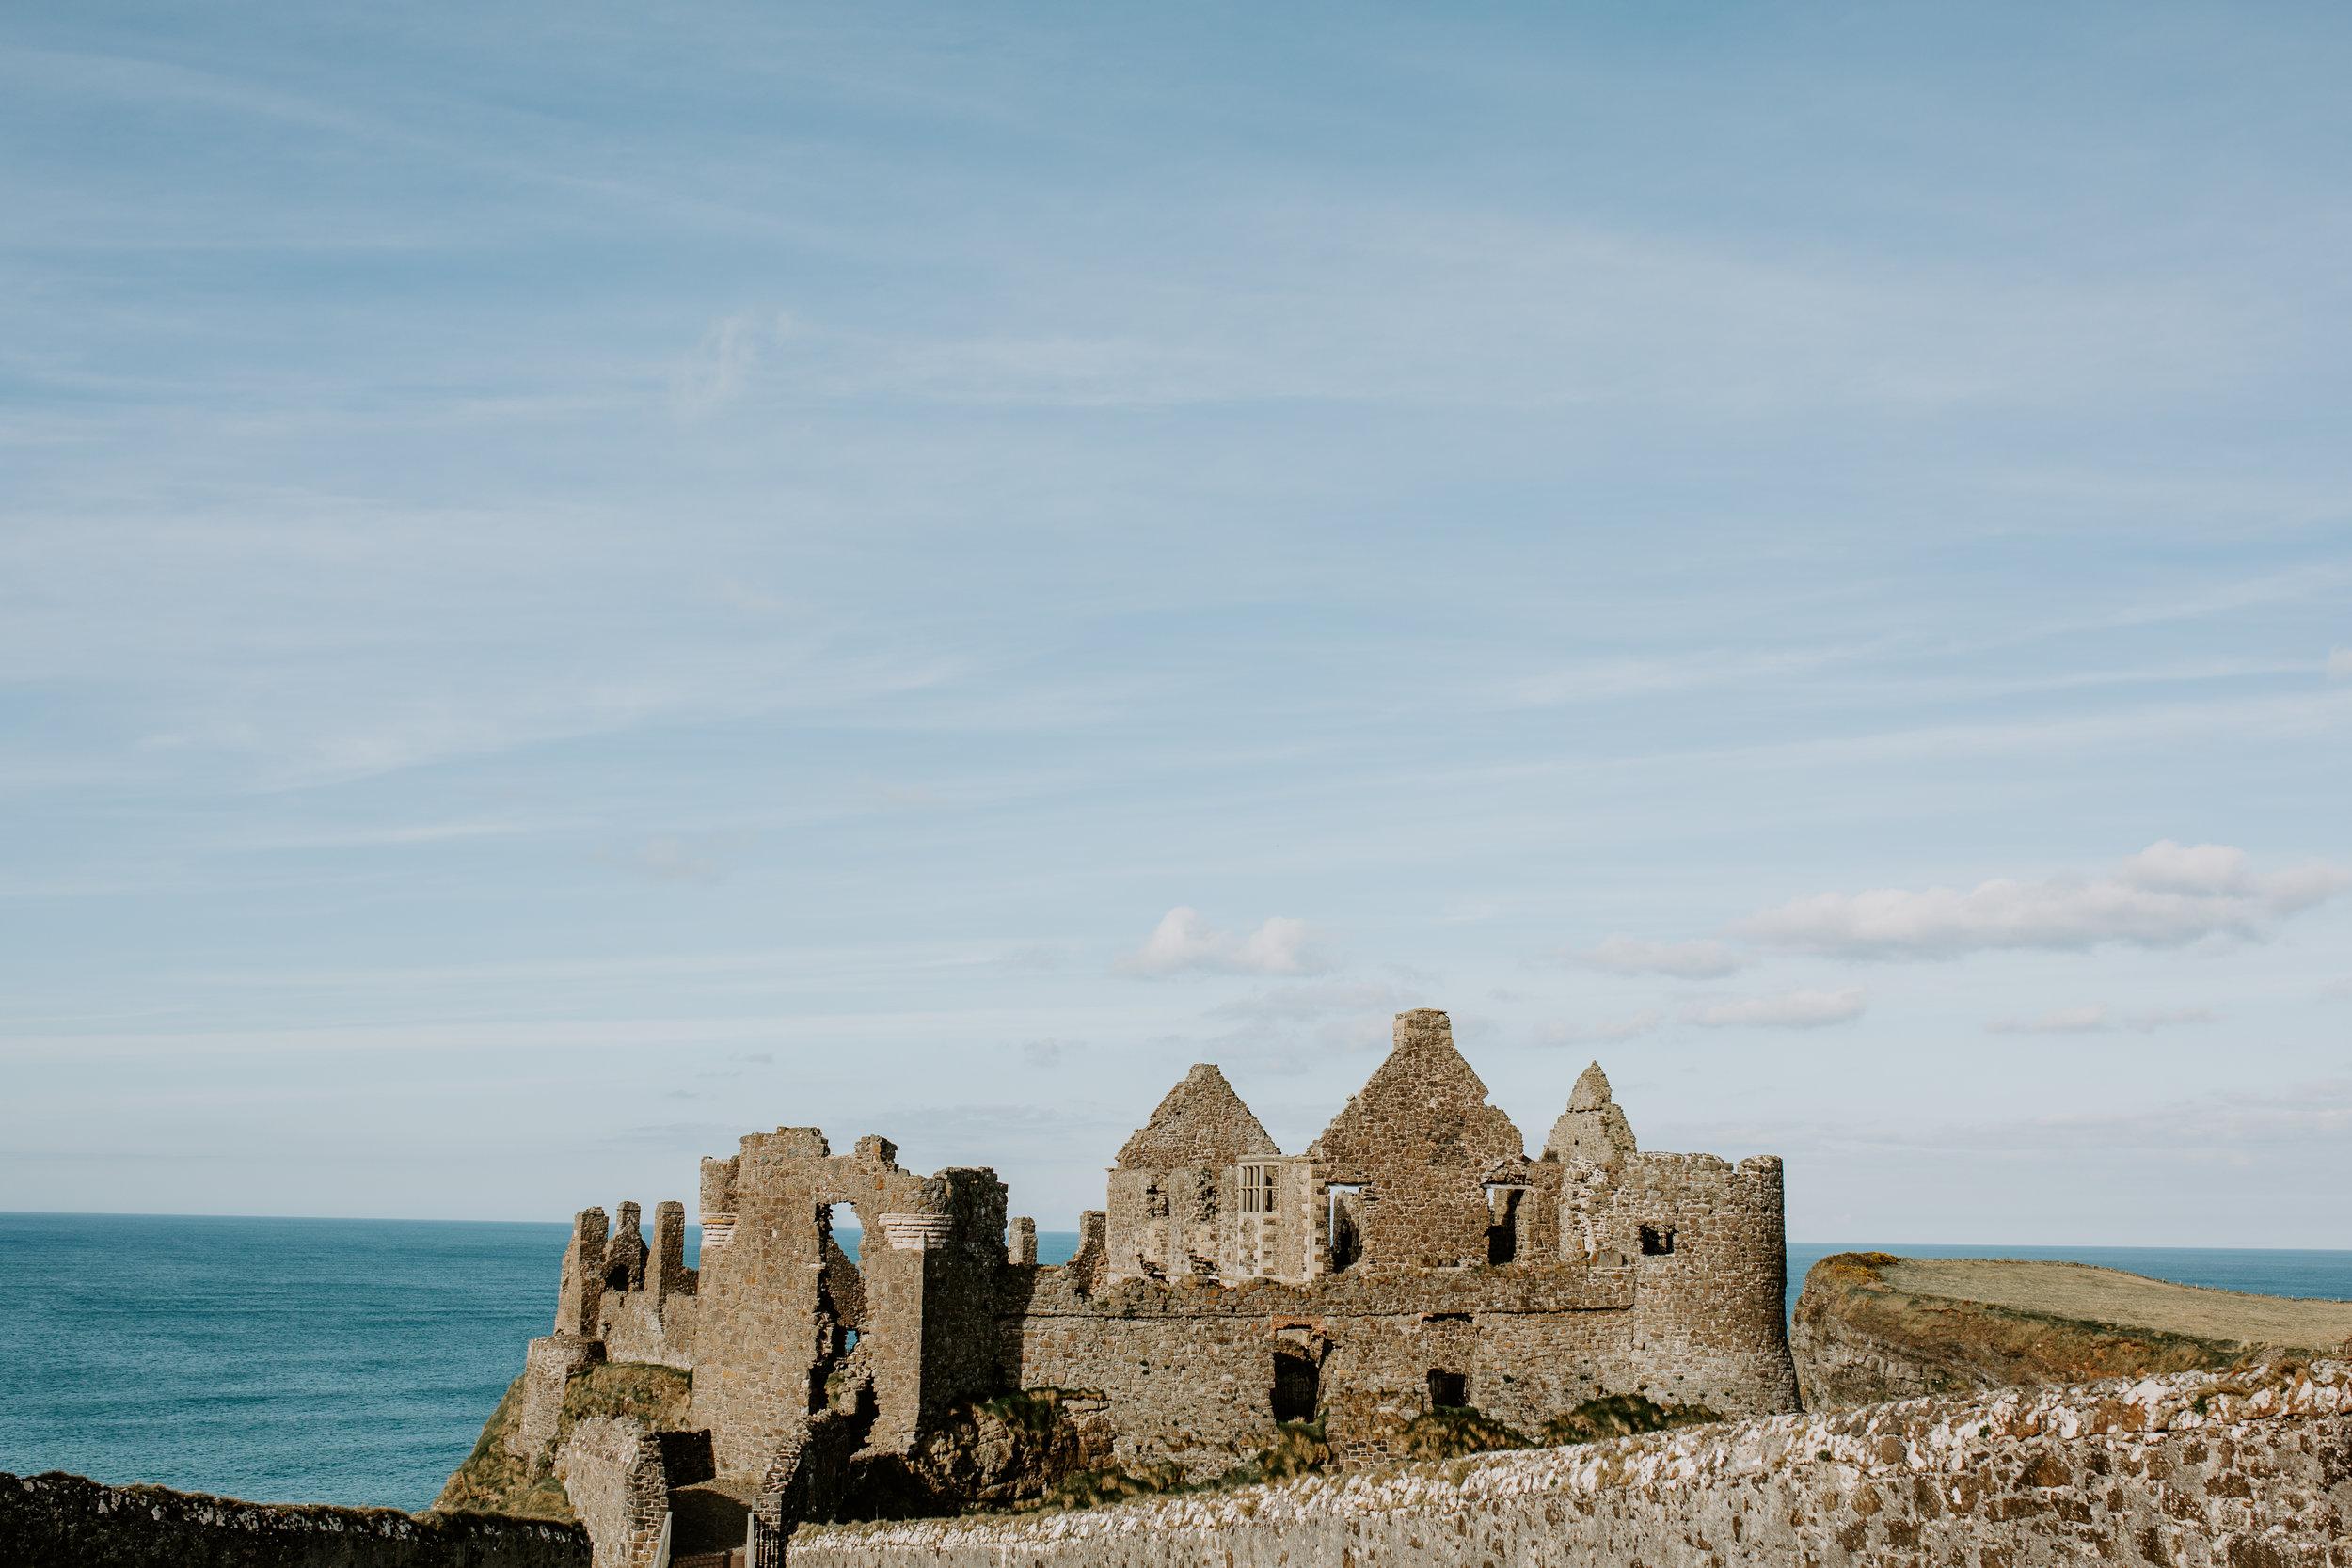 nicole-daacke-photography-ireland-destination-elopement-wedding-photographer-destination-wedding-irish-castle-wedding-intimate-ireland-wedding-photographer-ireland-elopement-photographer-dublin-howth-belfast-antrim-destination-wedding-photos-44.jpg